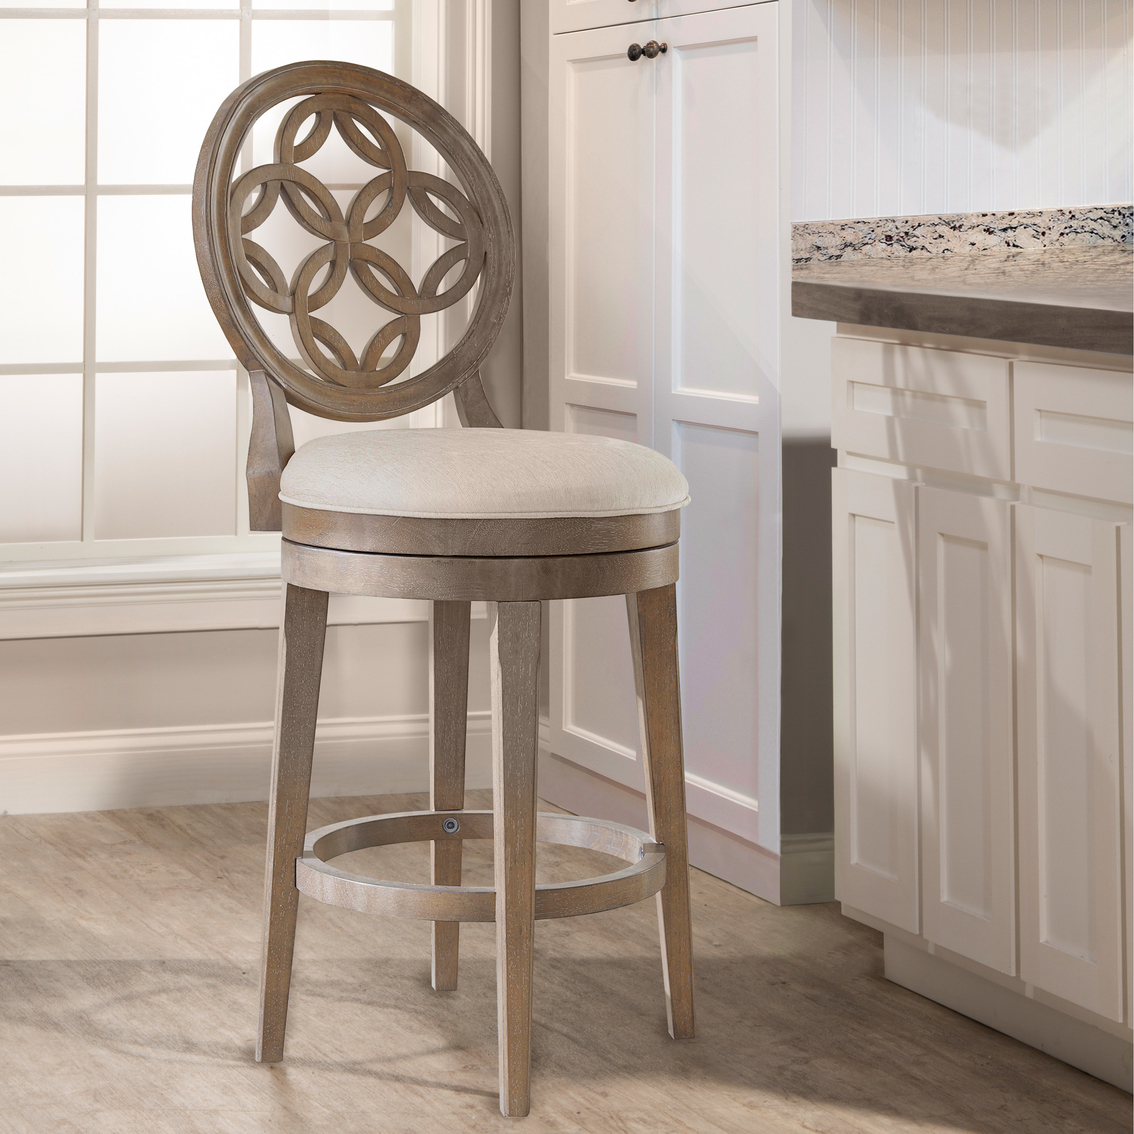 Surprising Hillsdale Savana Swivel Counter Stool Dining Seating Creativecarmelina Interior Chair Design Creativecarmelinacom